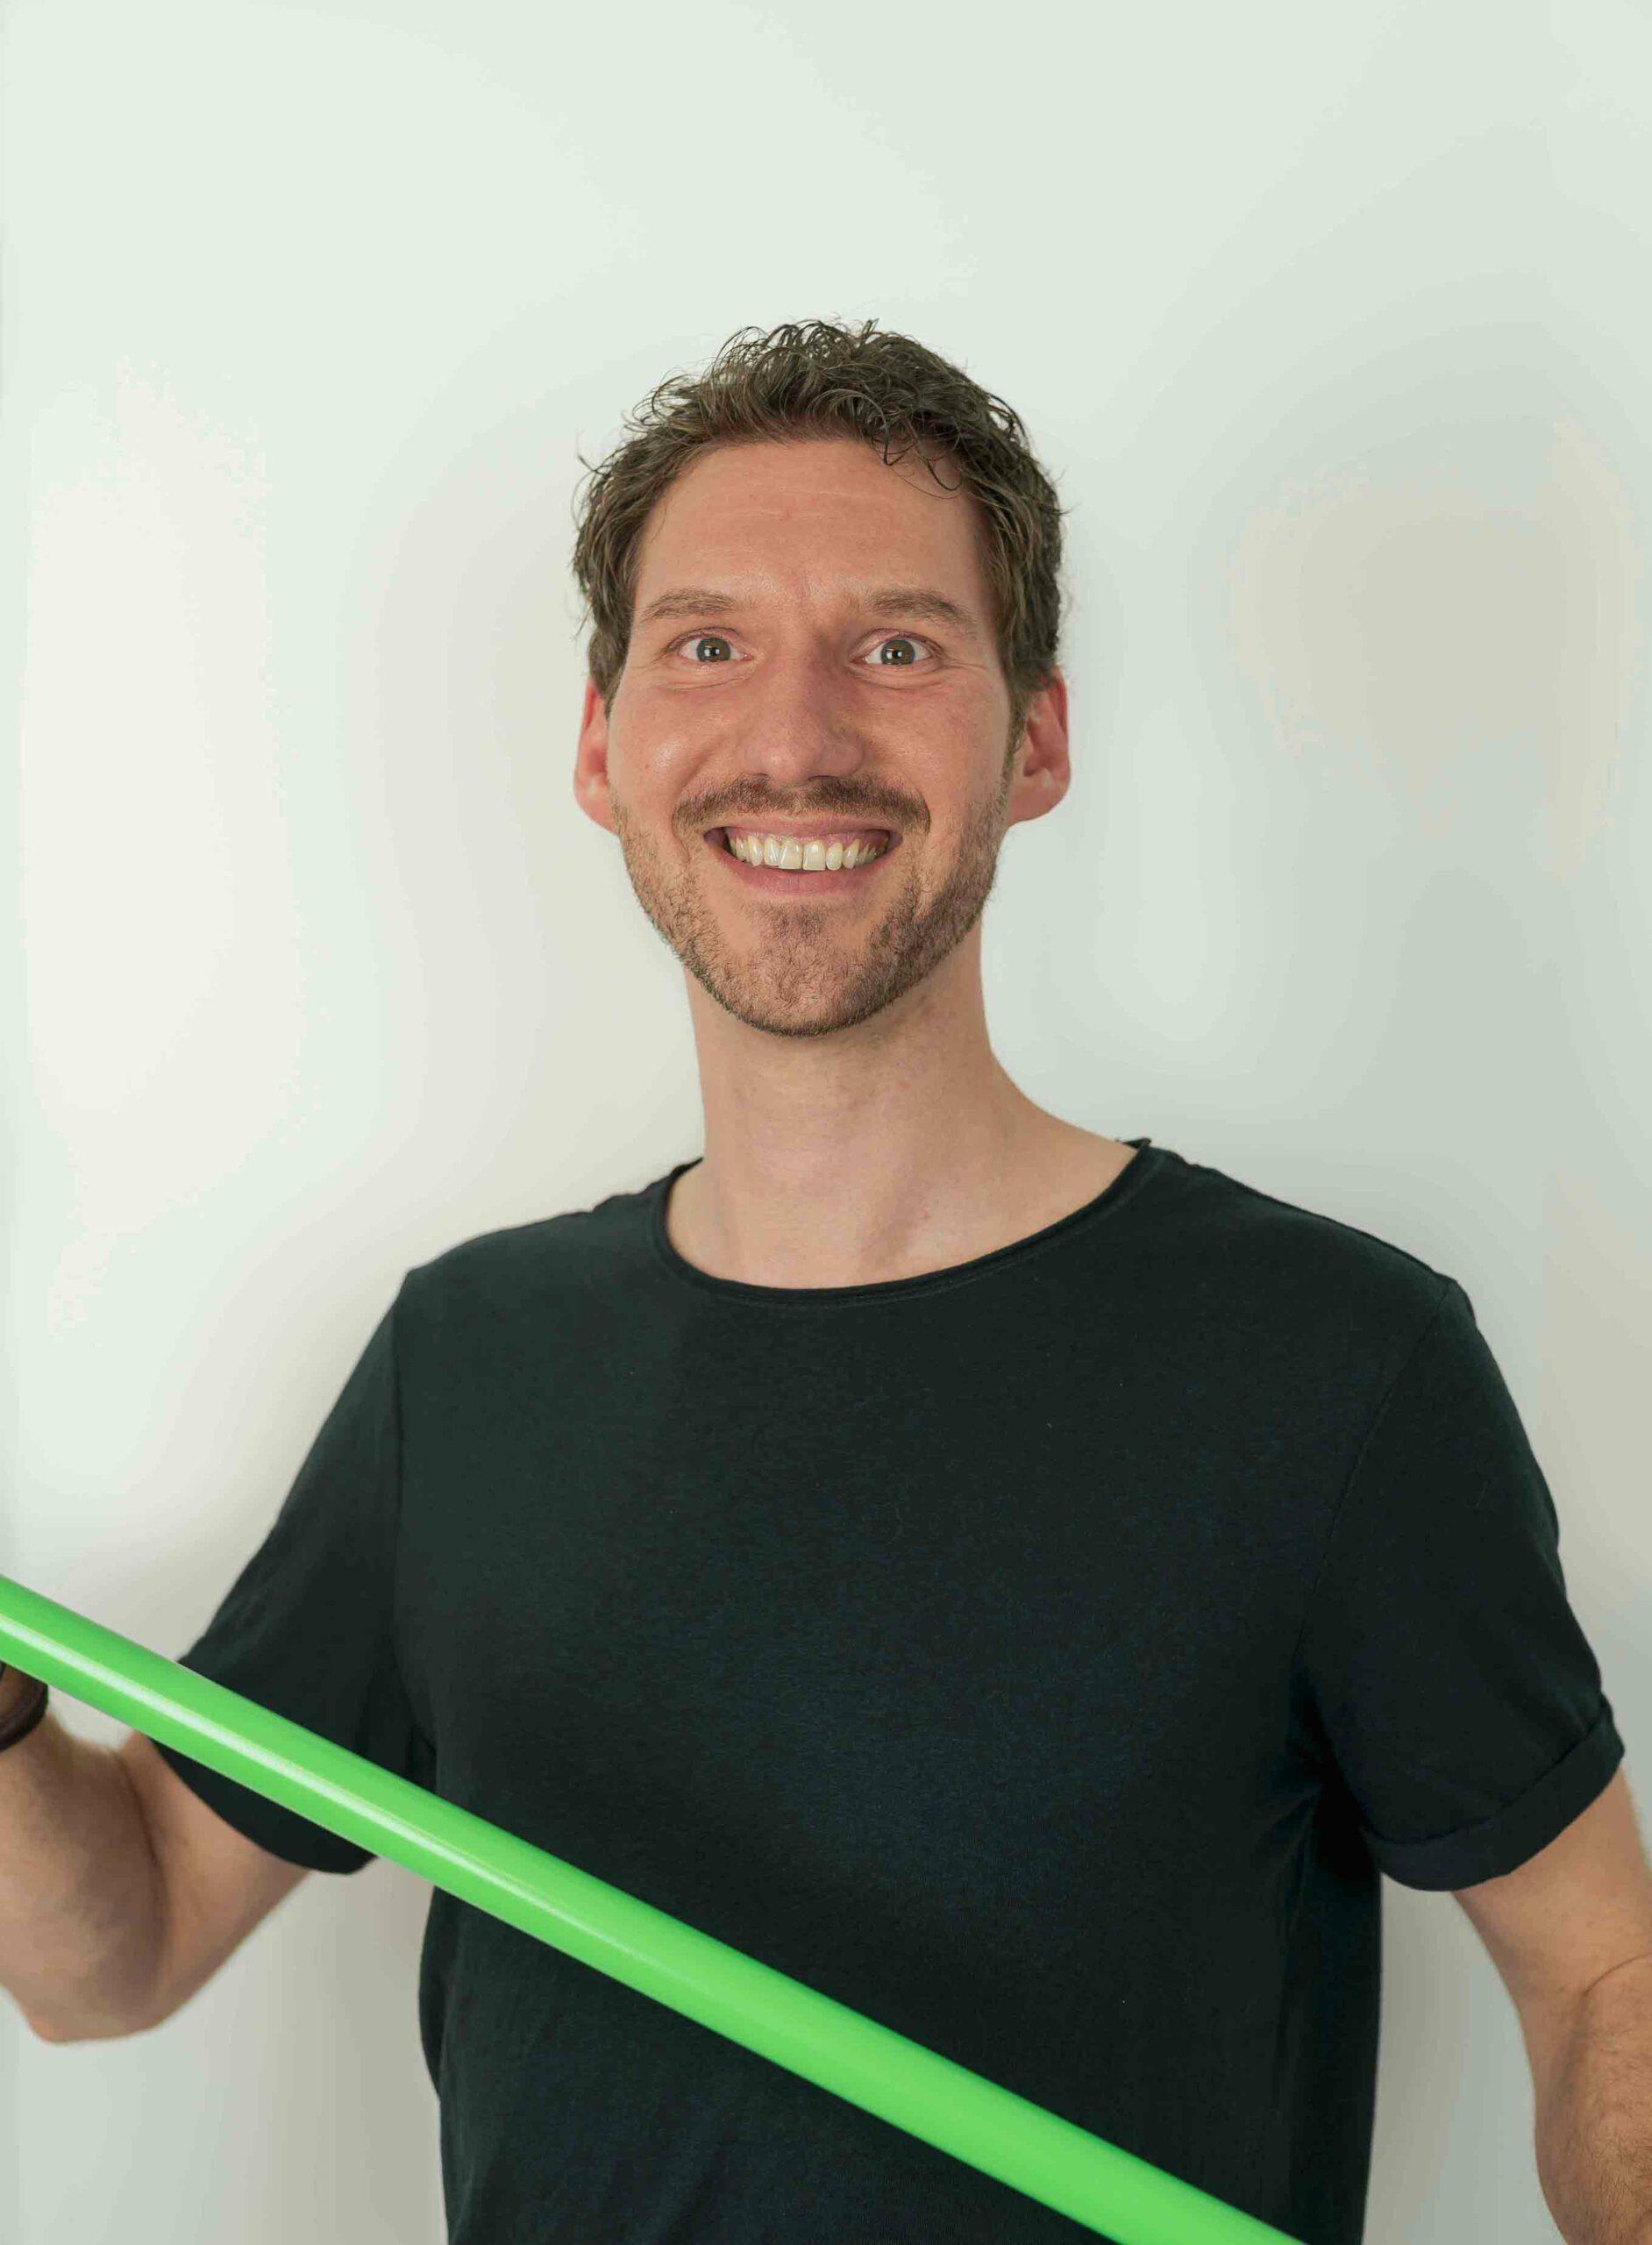 Patrick Kühl - Inhaber Physiotherapie Physio Plus GbR Inden